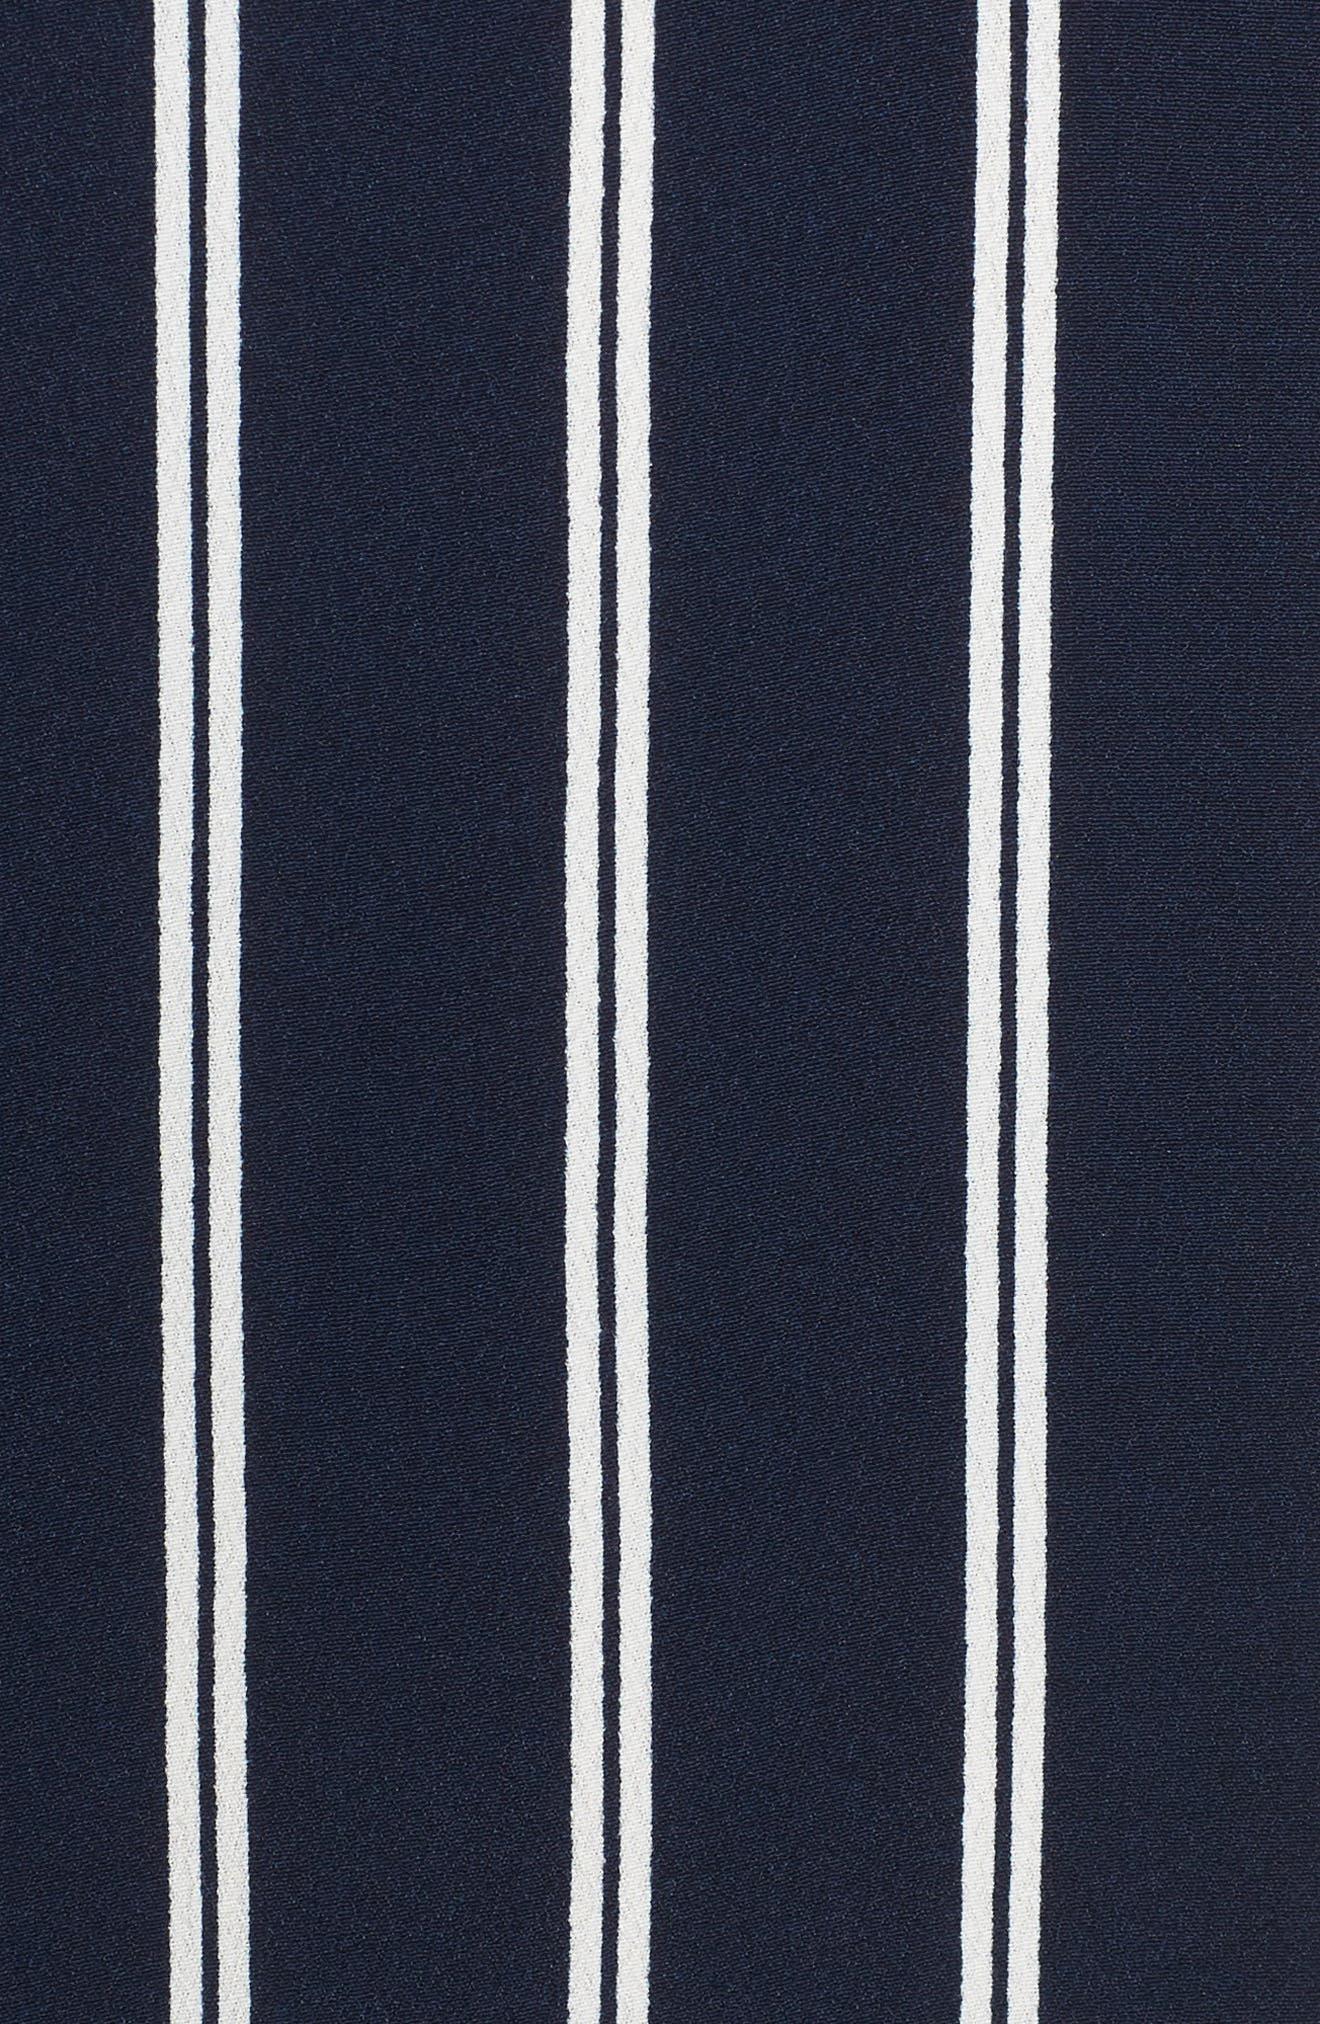 Stripe Plaza Dress,                             Alternate thumbnail 5, color,                             Double Deep Navy